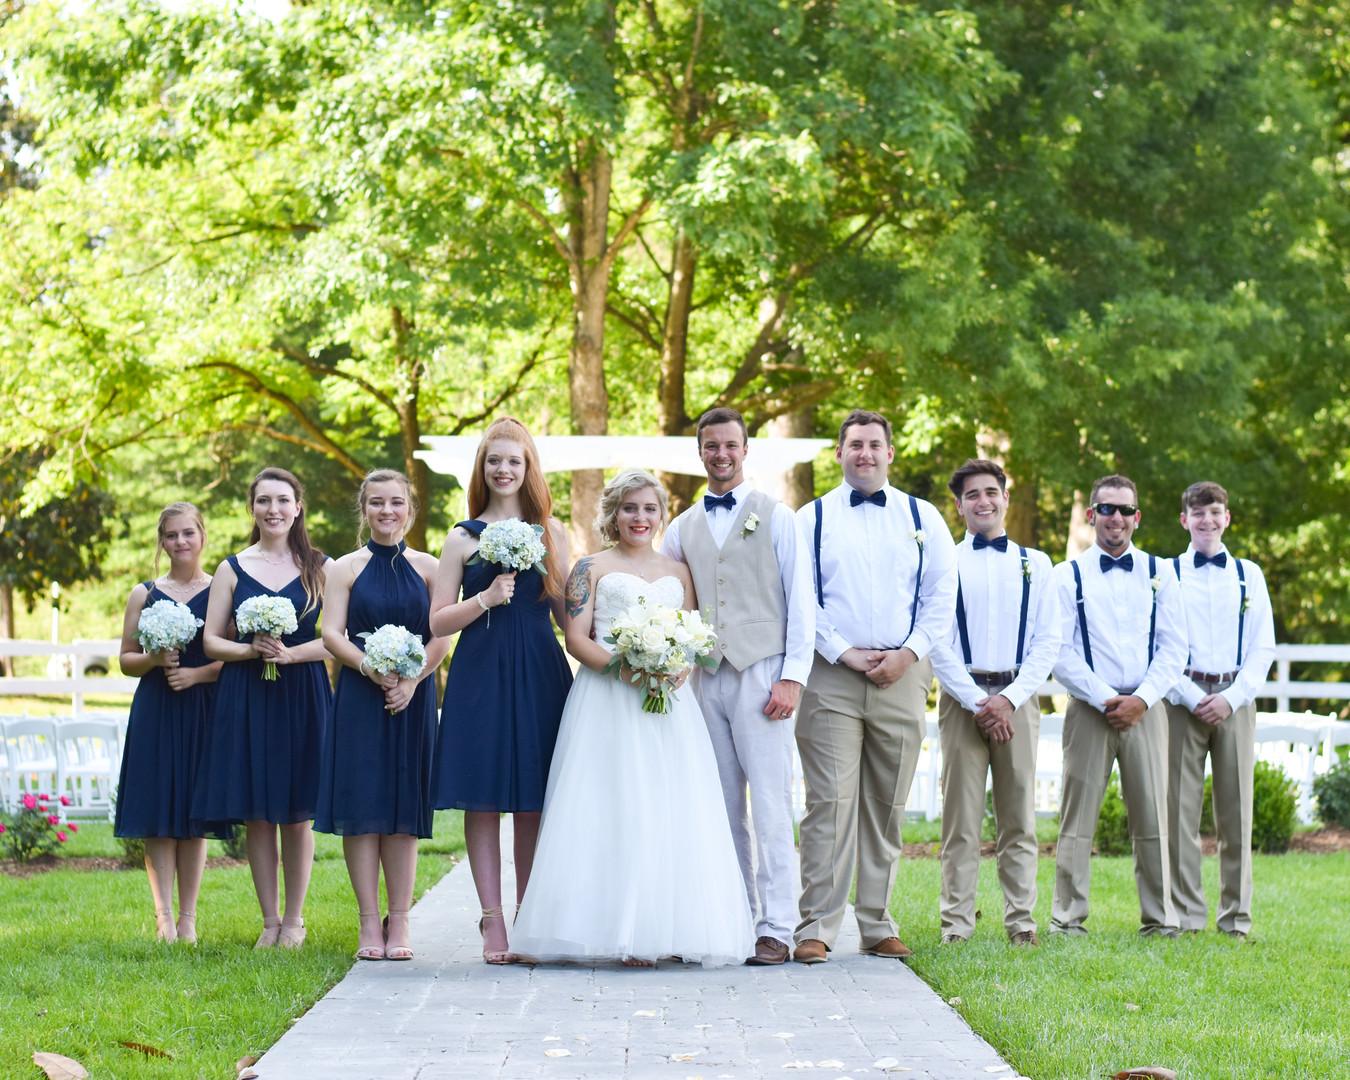 NC formal Garden Wedding